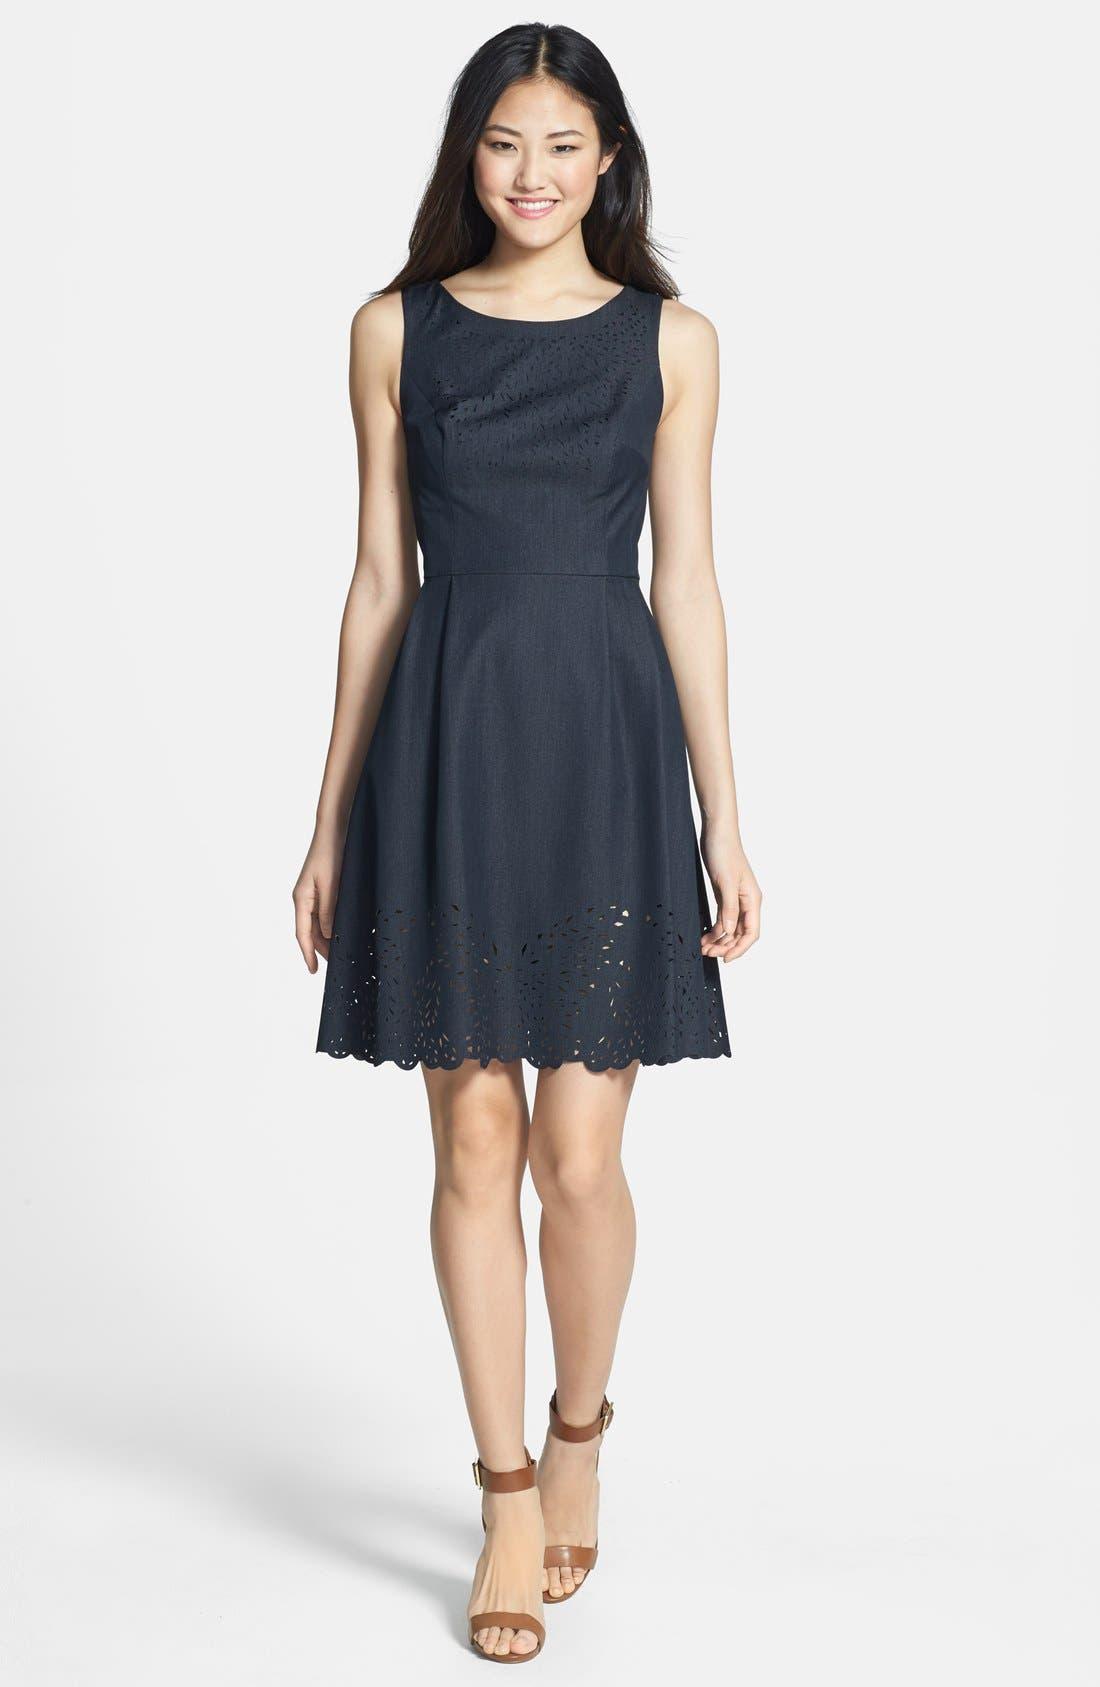 Main Image - Betsey Johnson Laser Cut Denim Fit & Flare Dress